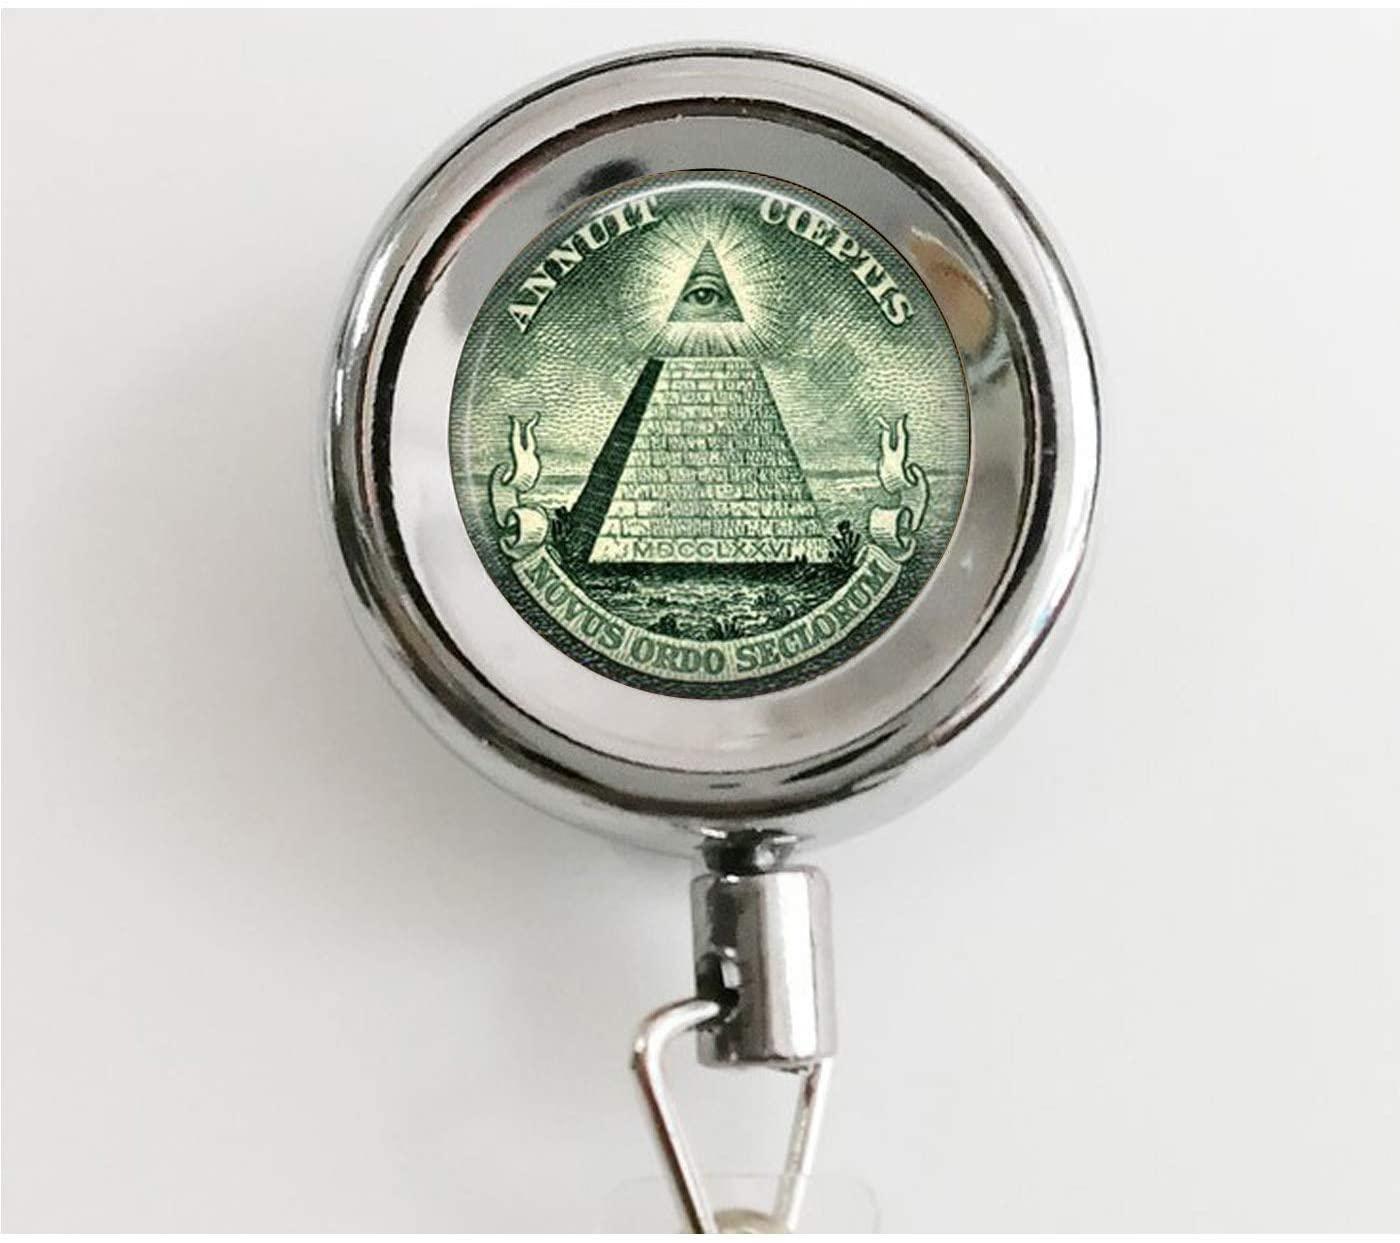 All Seeing Eye - Illuminati Dollar Bill - Eye of Providence - Pyramid - Dollar Bill Keychain Retractable Badge Reel with Waterproof ID Holders & Keychain